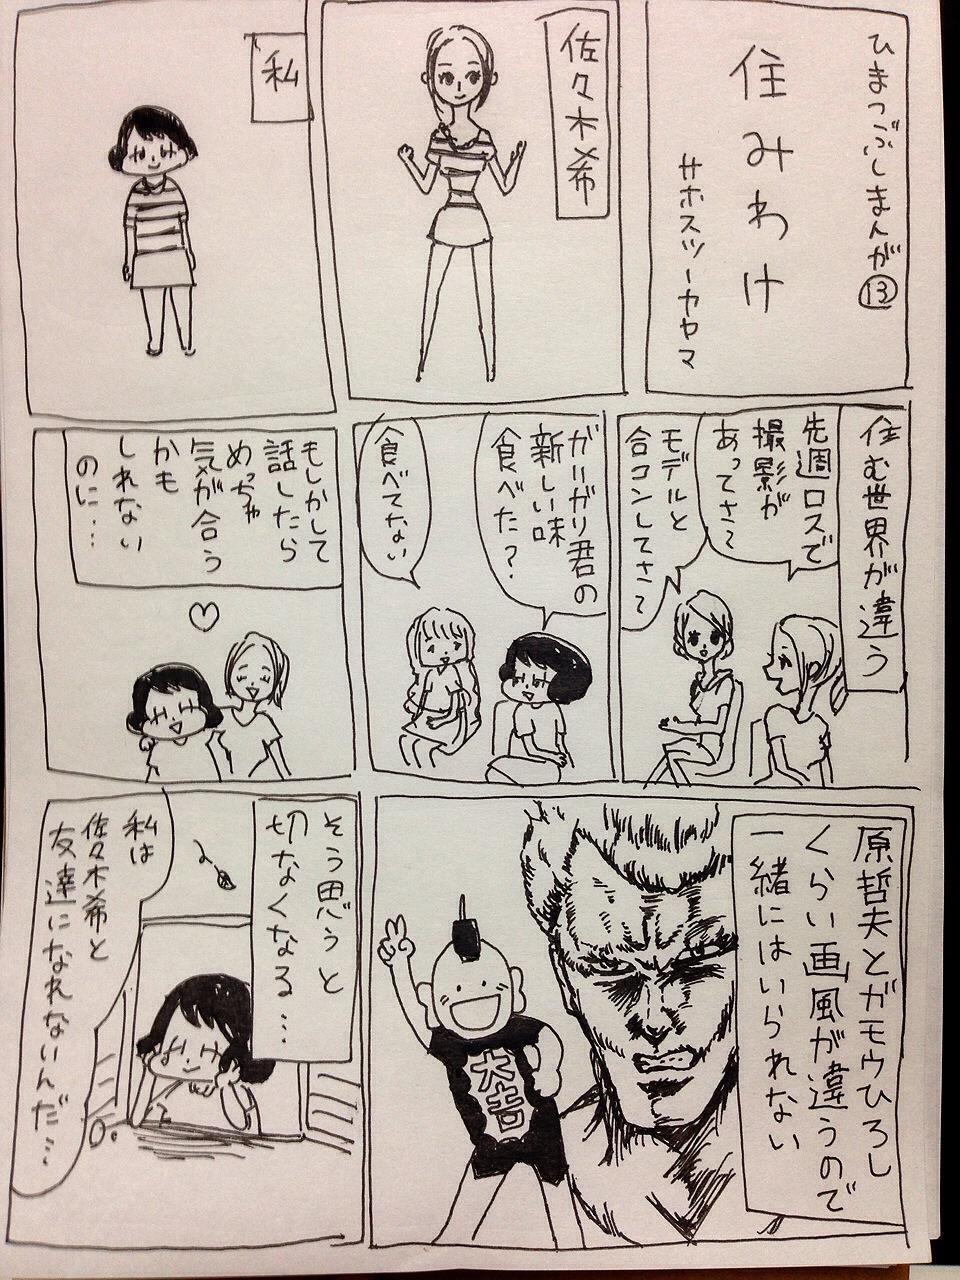 Share 一般コミック Page 397 [無断転載禁止]©2ch.netYouTube動画>2本 ->画像>897枚